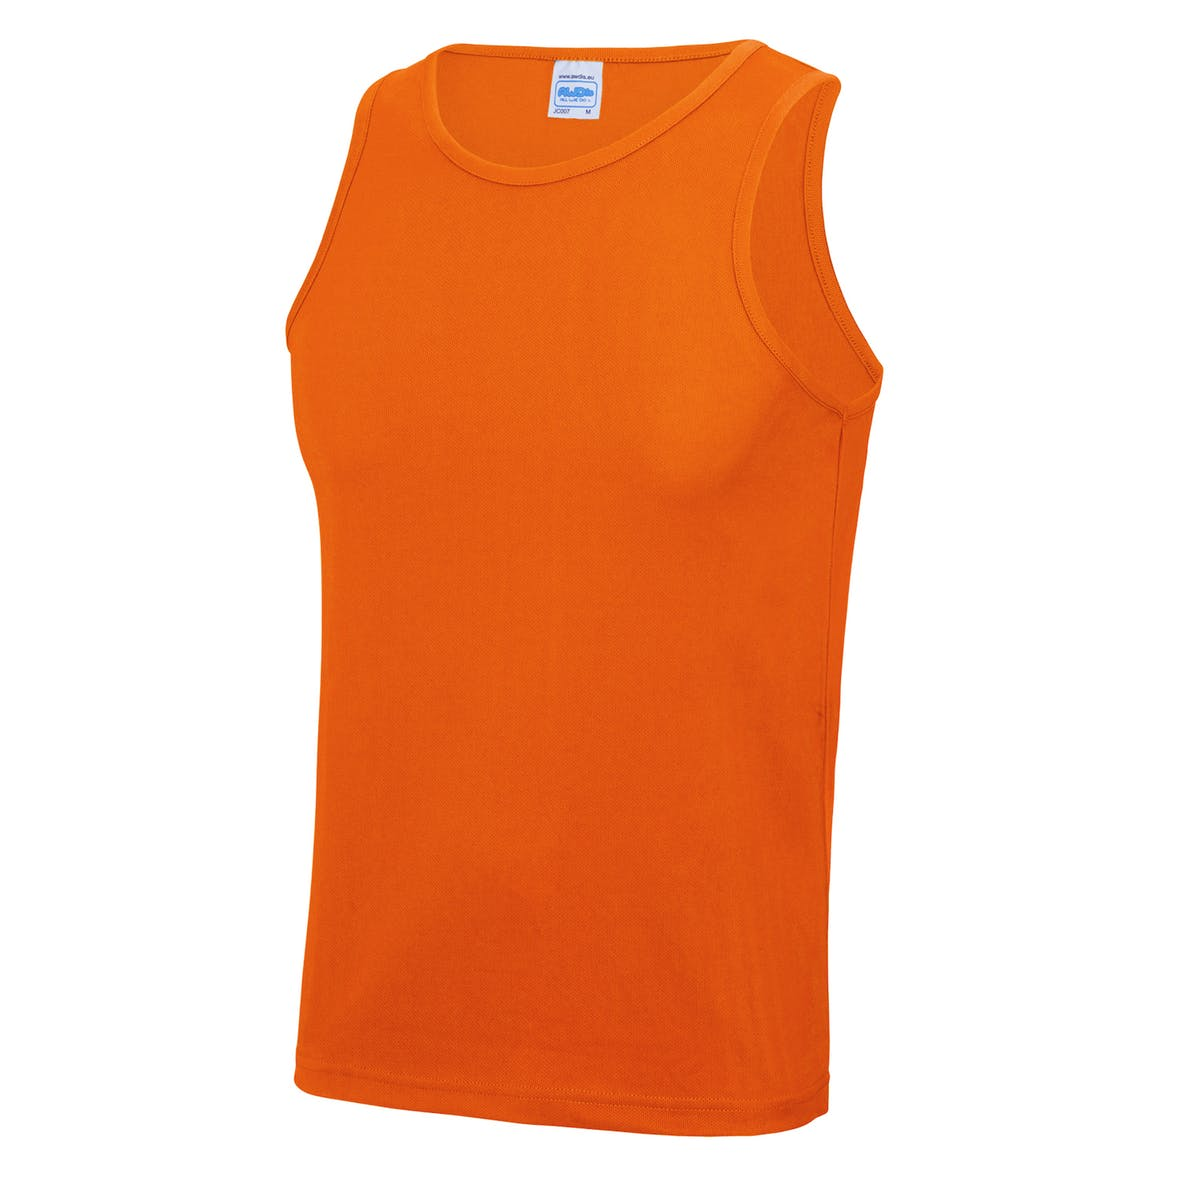 elec orange sports vest